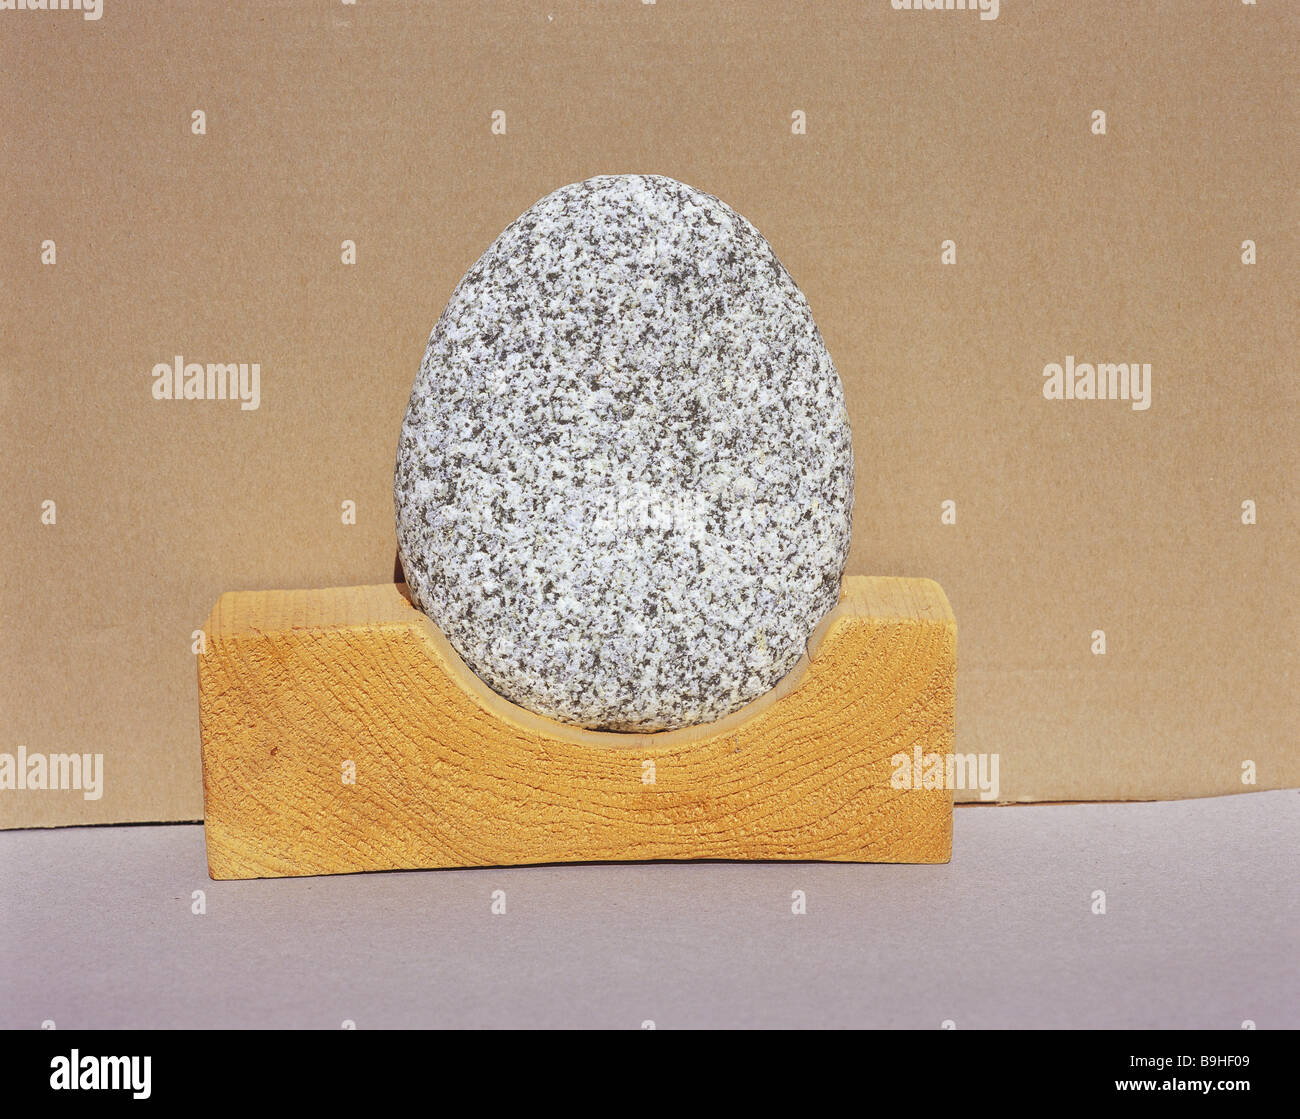 nature-art wood stone stone shingle river-shingle round oval gray scrutinized granite wooden-pedestal semicircle - Stock Image